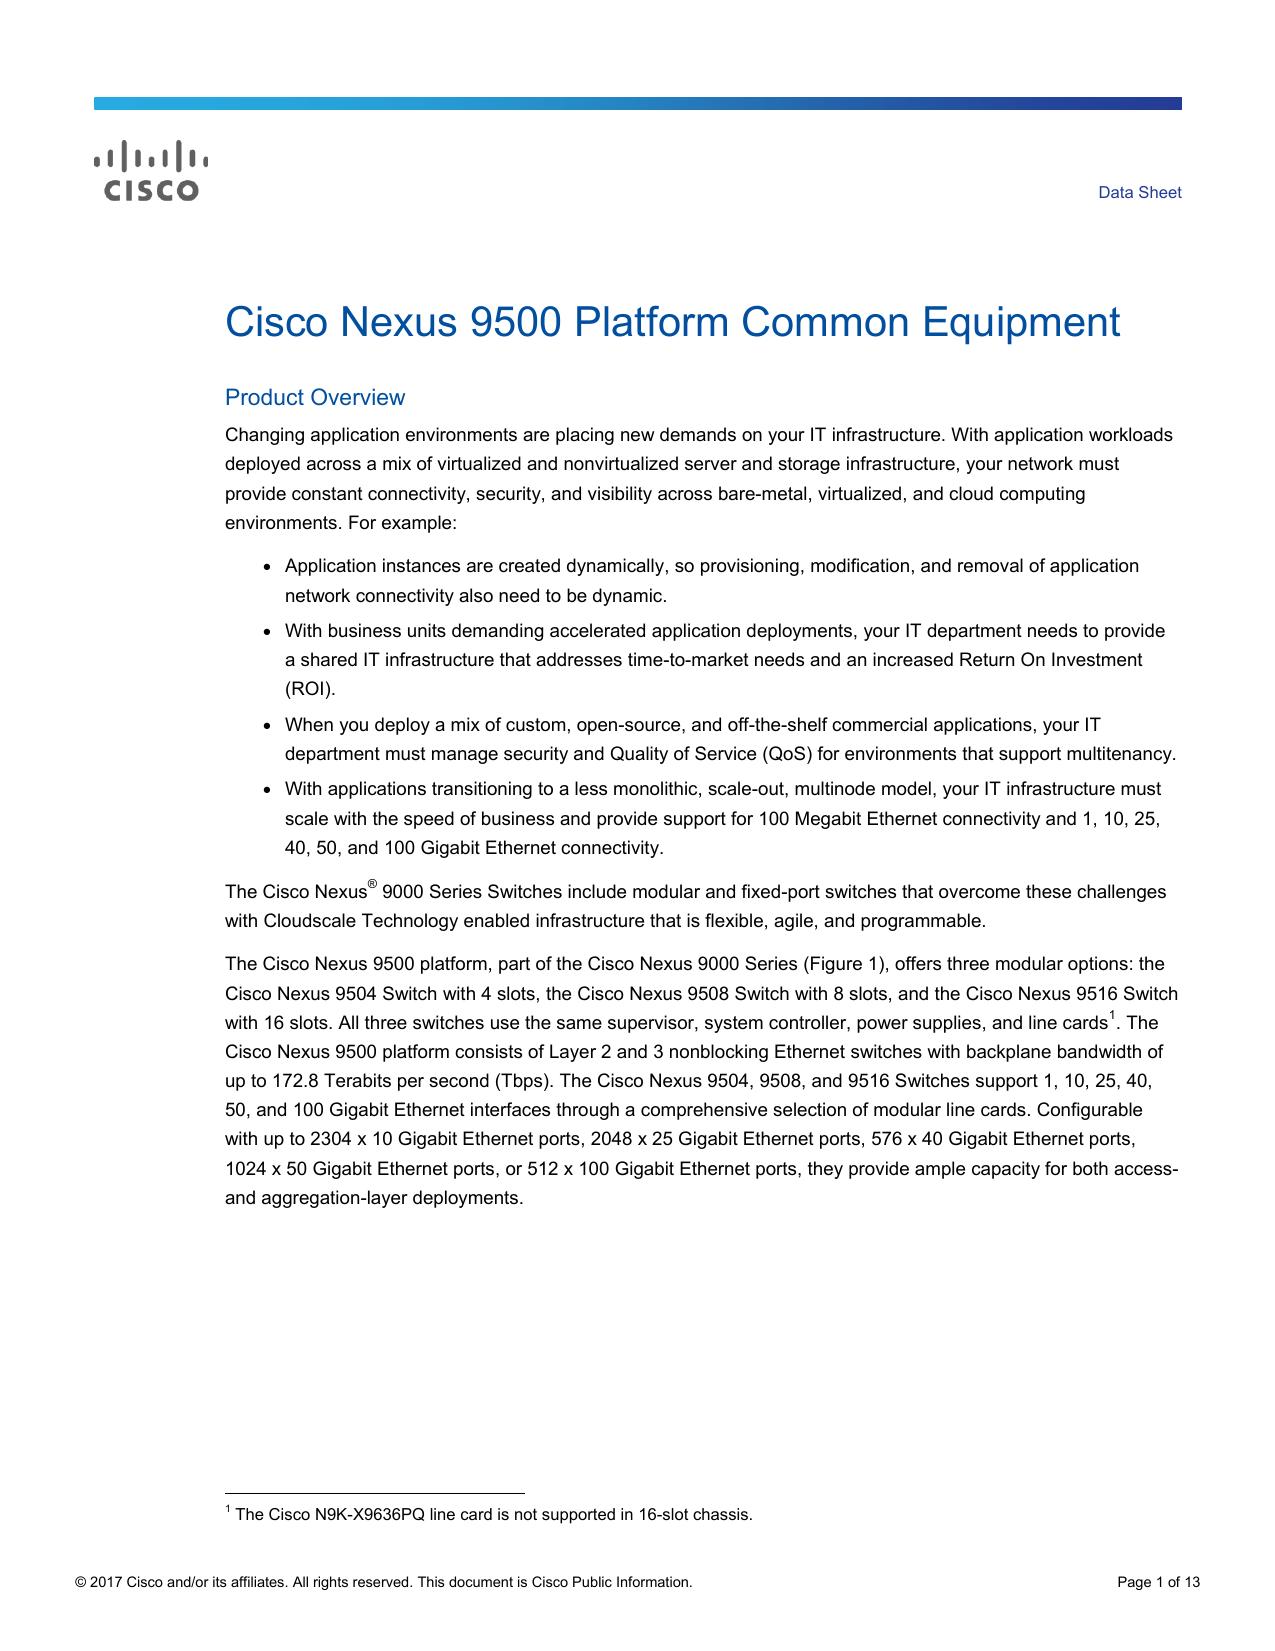 Cisco Nexus 9500 Platform Common Equipment Data Sheet | manualzz com